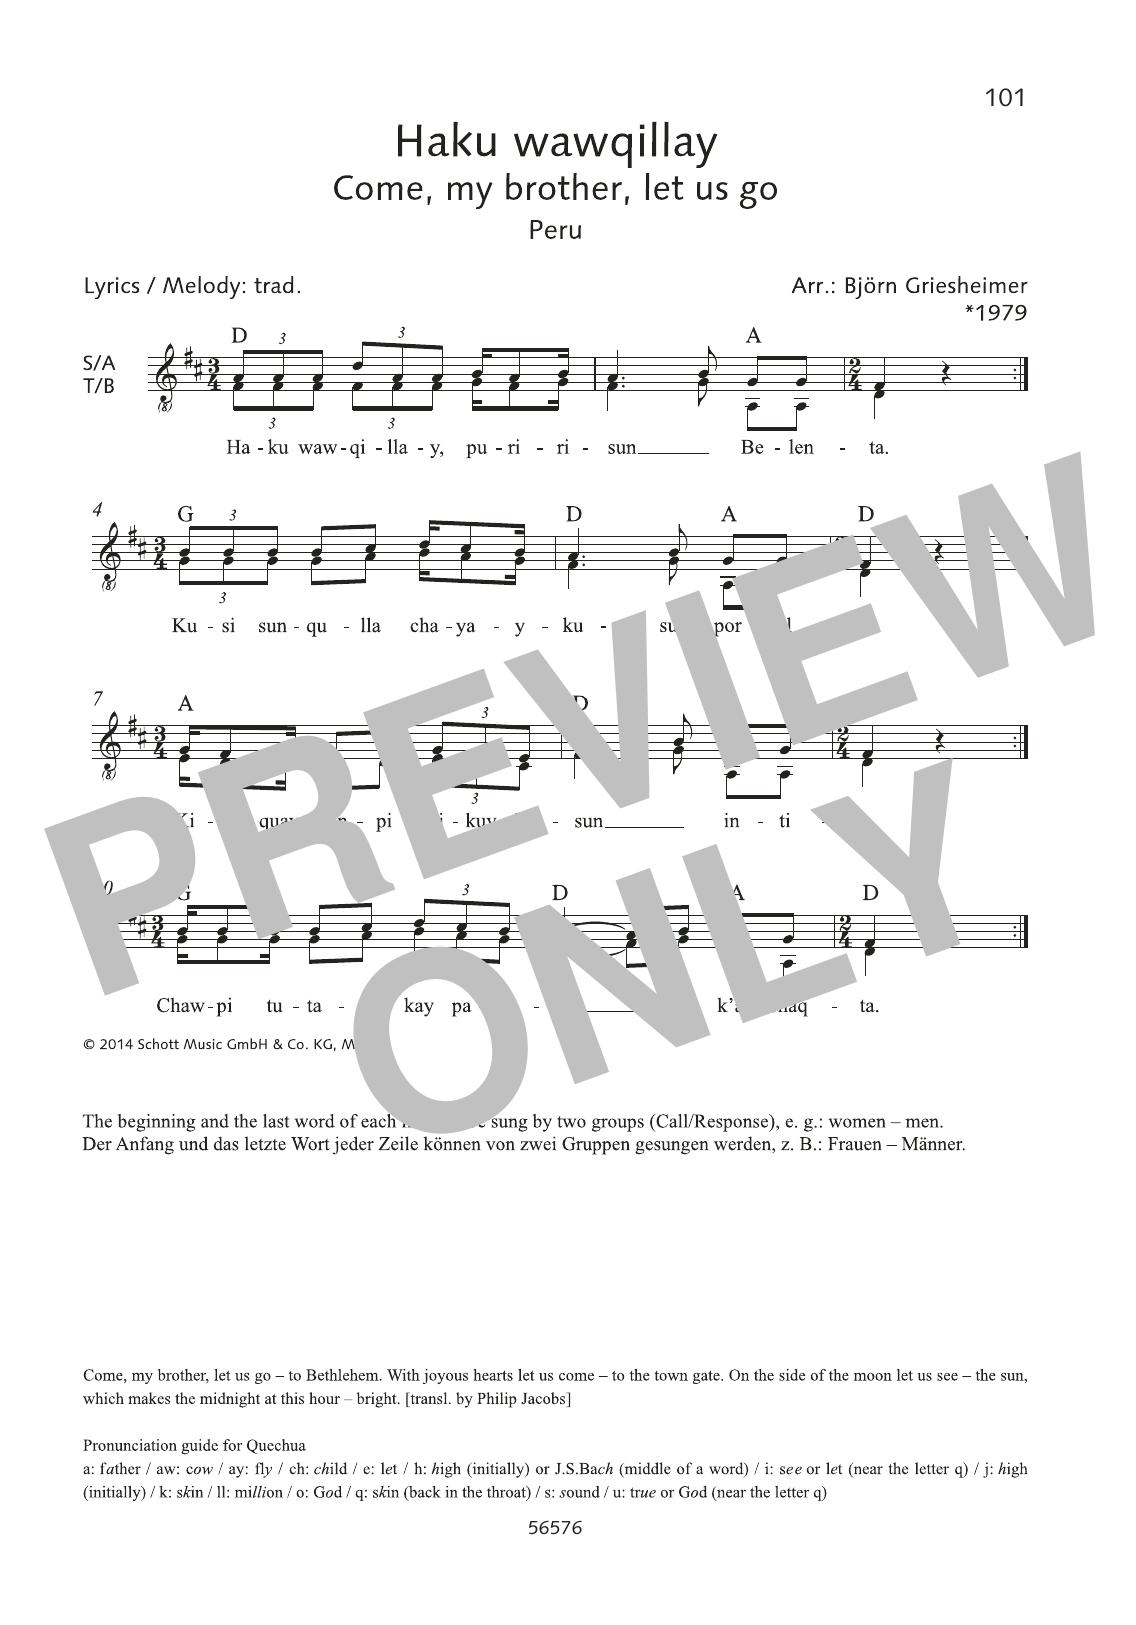 Haku wawqillay Sheet Music